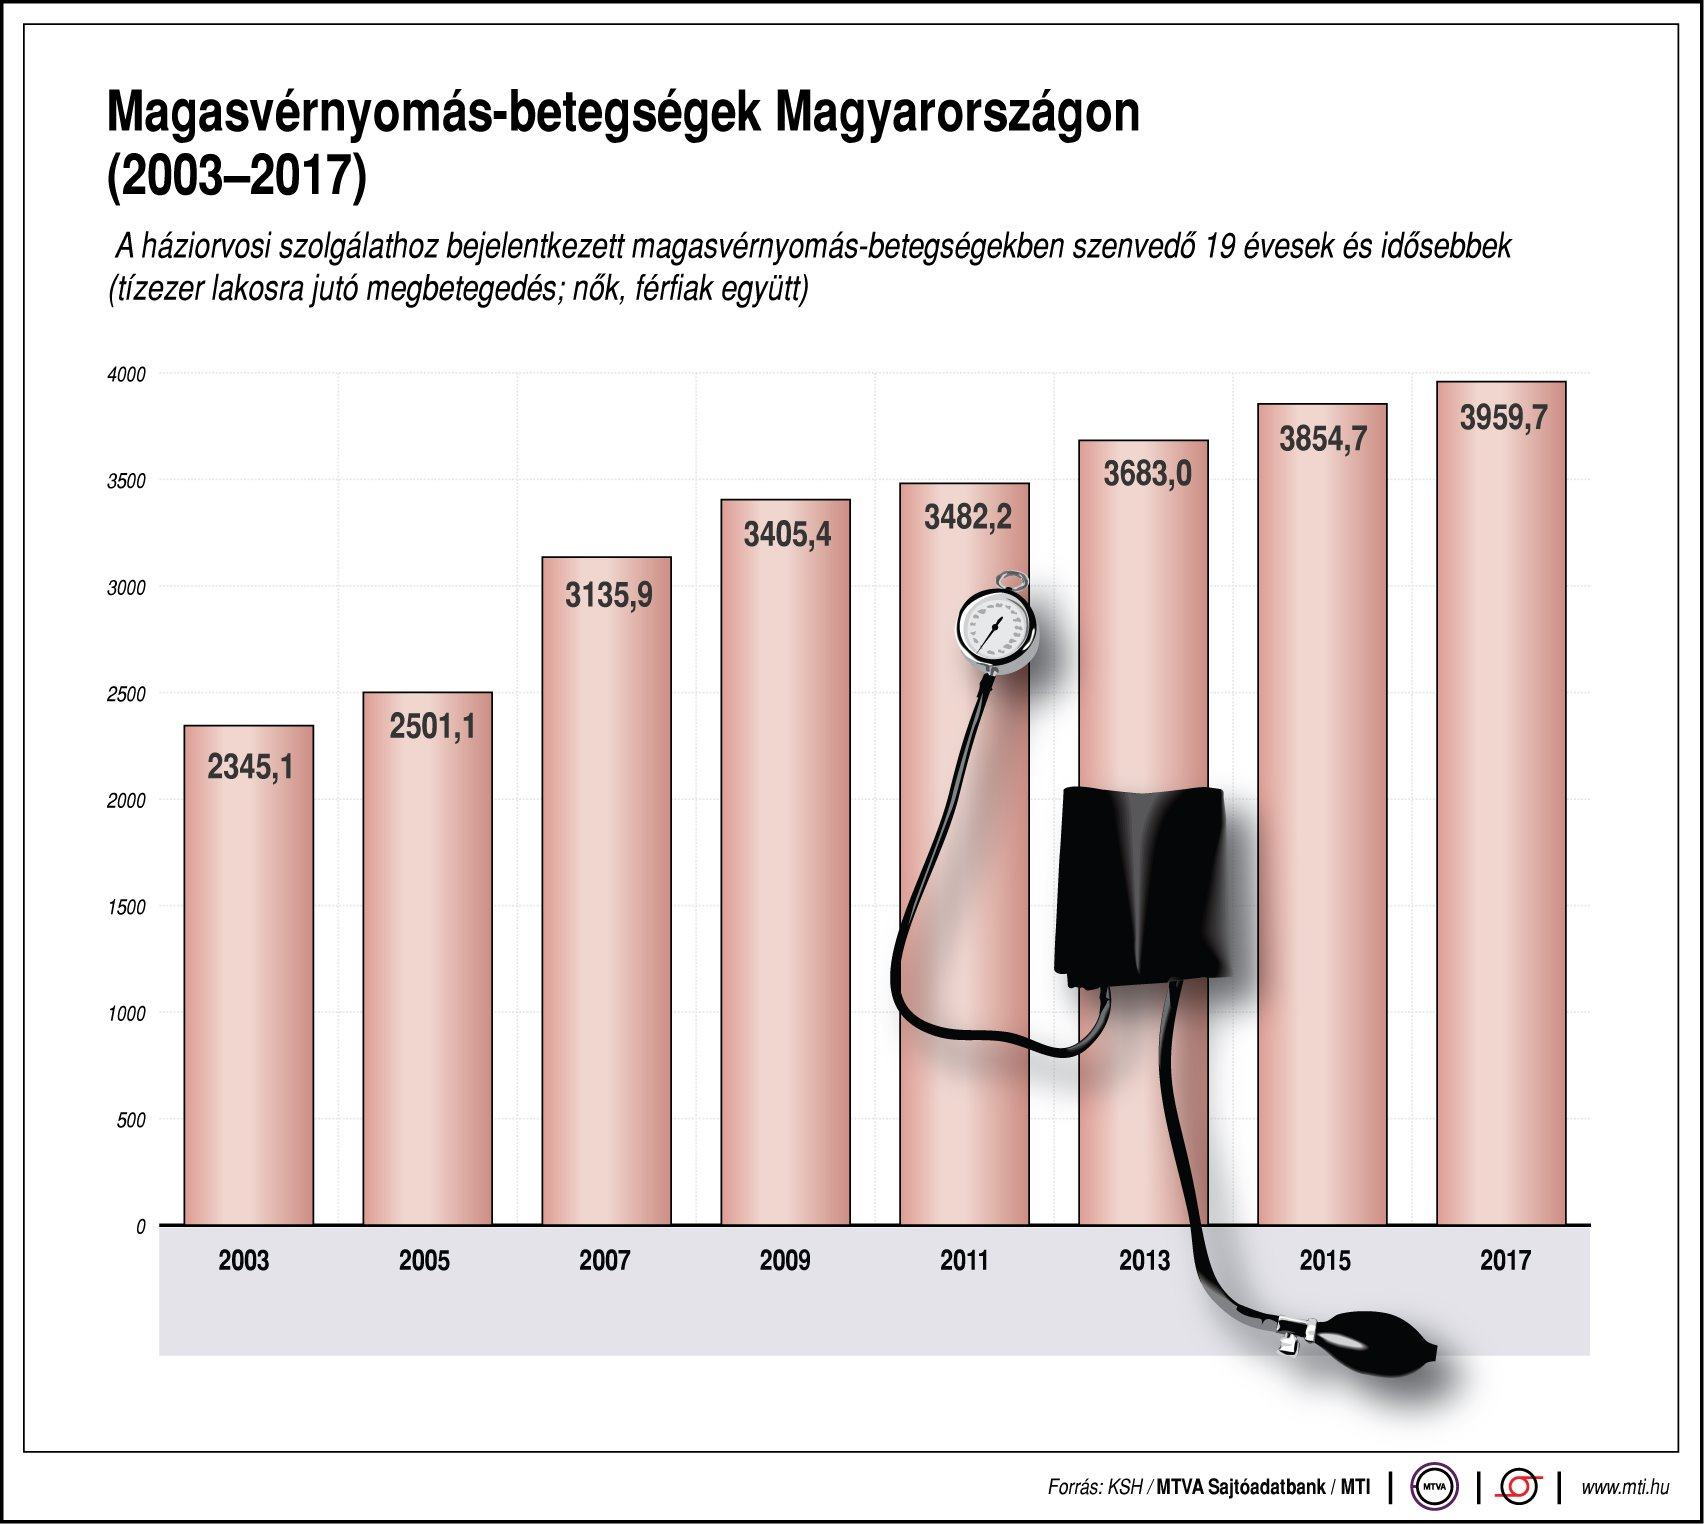 magas vérnyomásban nyugdíjba ademetionin magas vérnyomás esetén